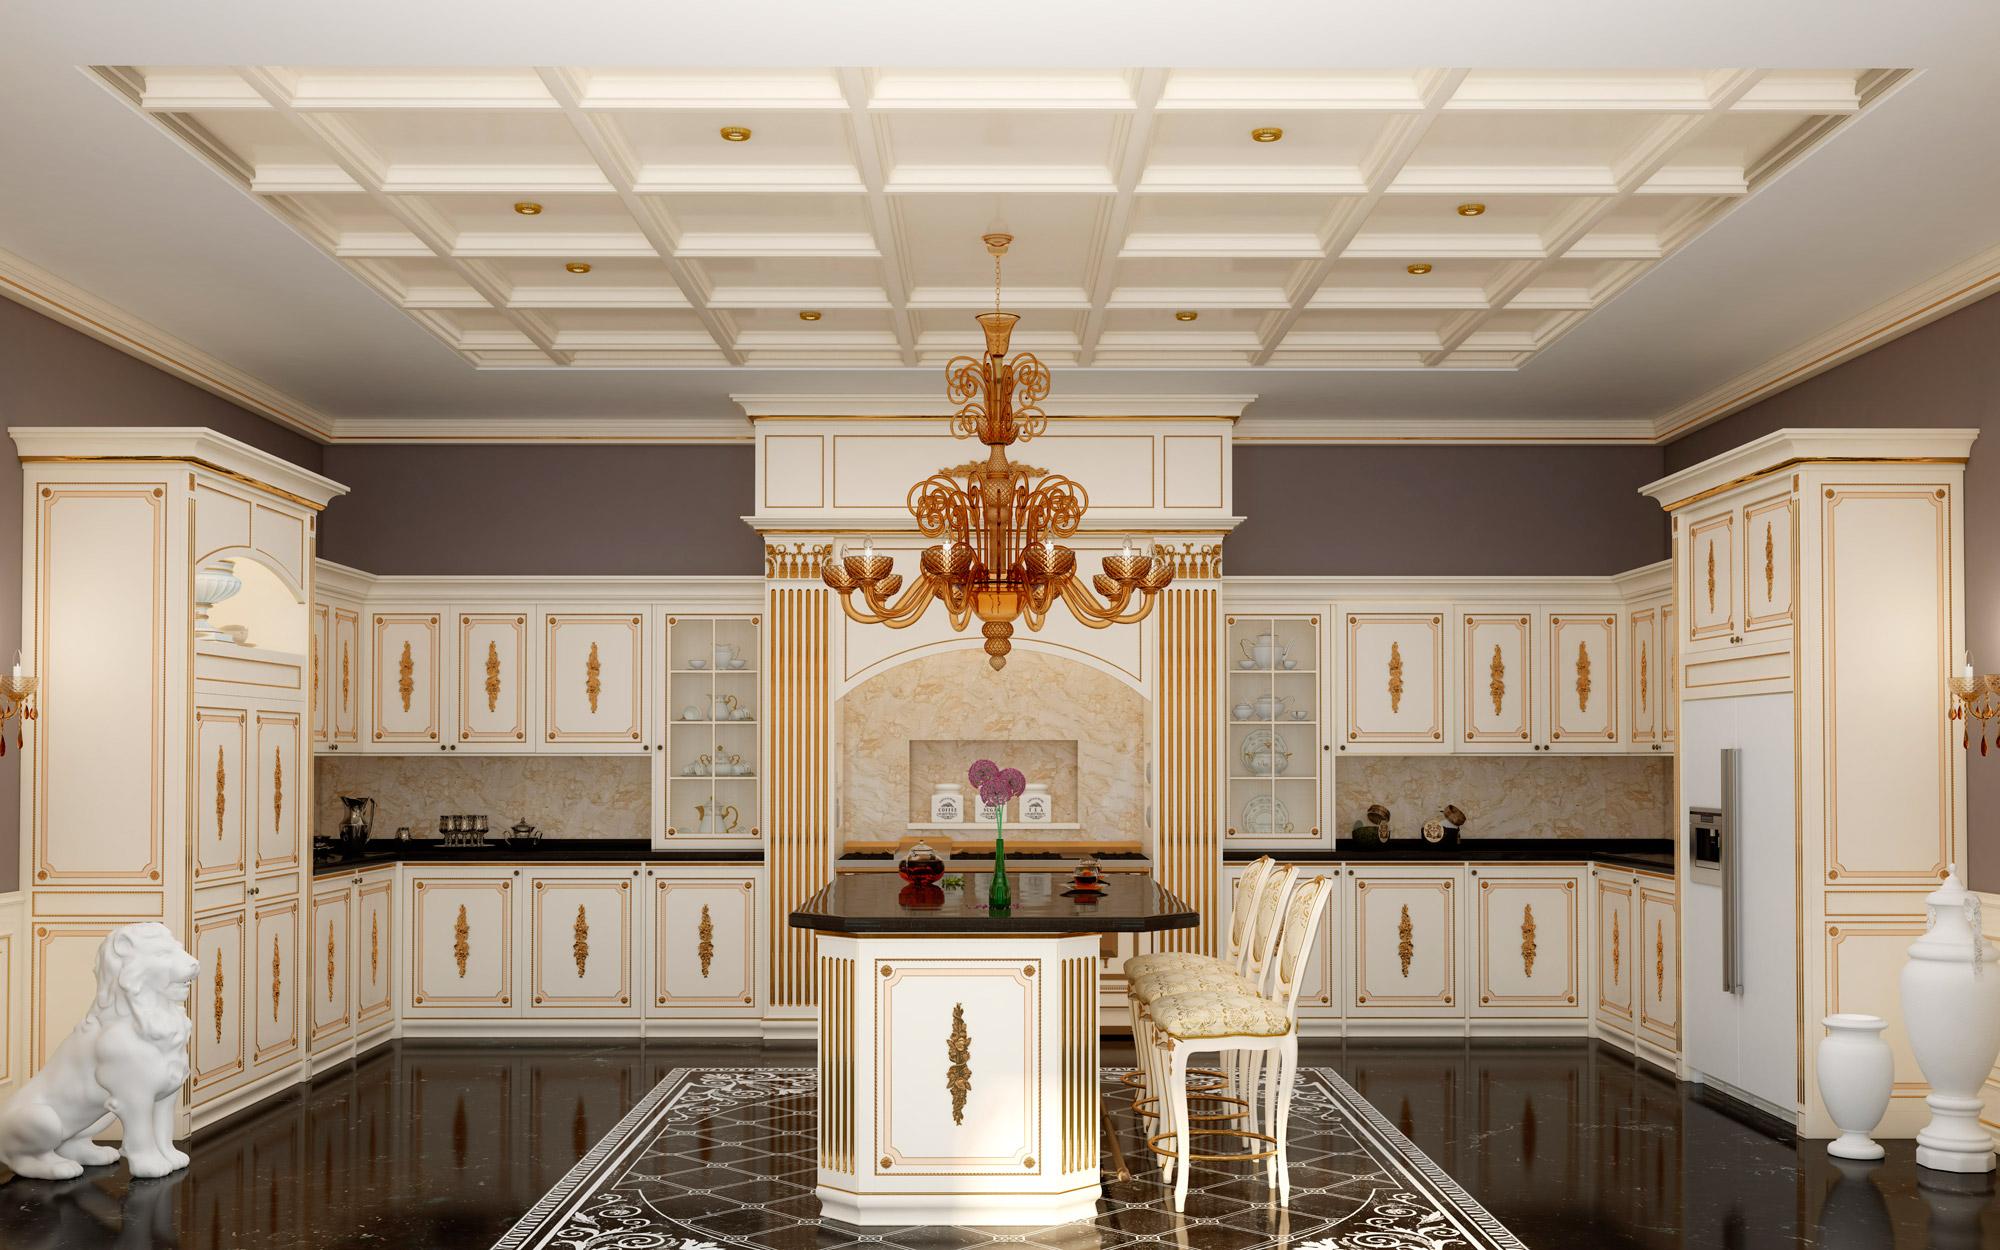 Cucina su misura classica olga vimercati meda for Arredamenti classici eleganti